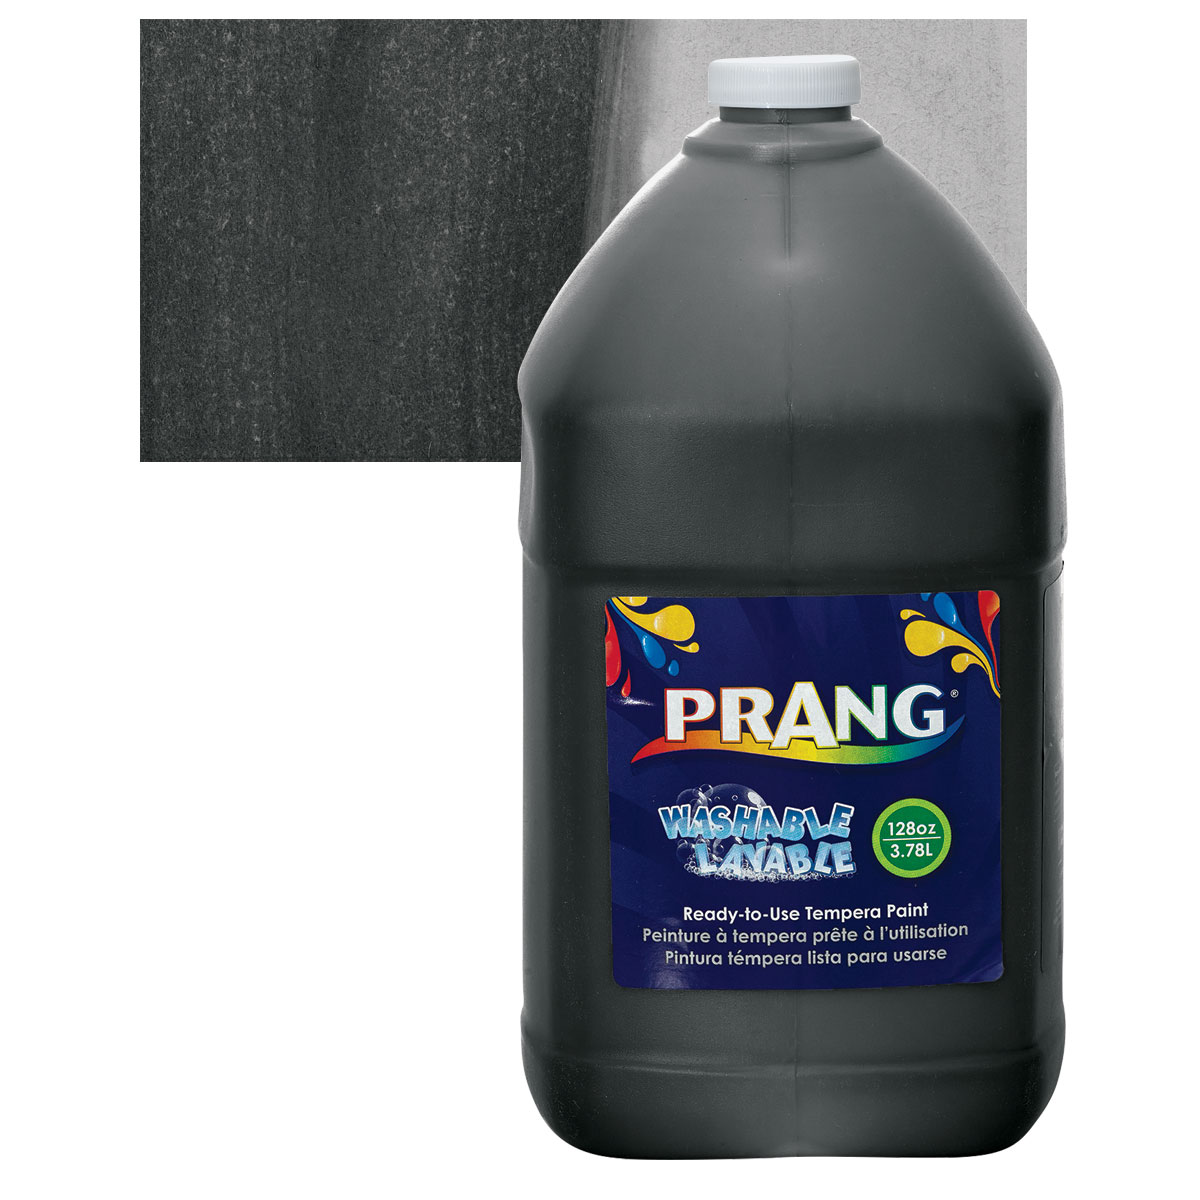 Prang Ready-To-Use Washable Tempera Paint - Black, Gallon